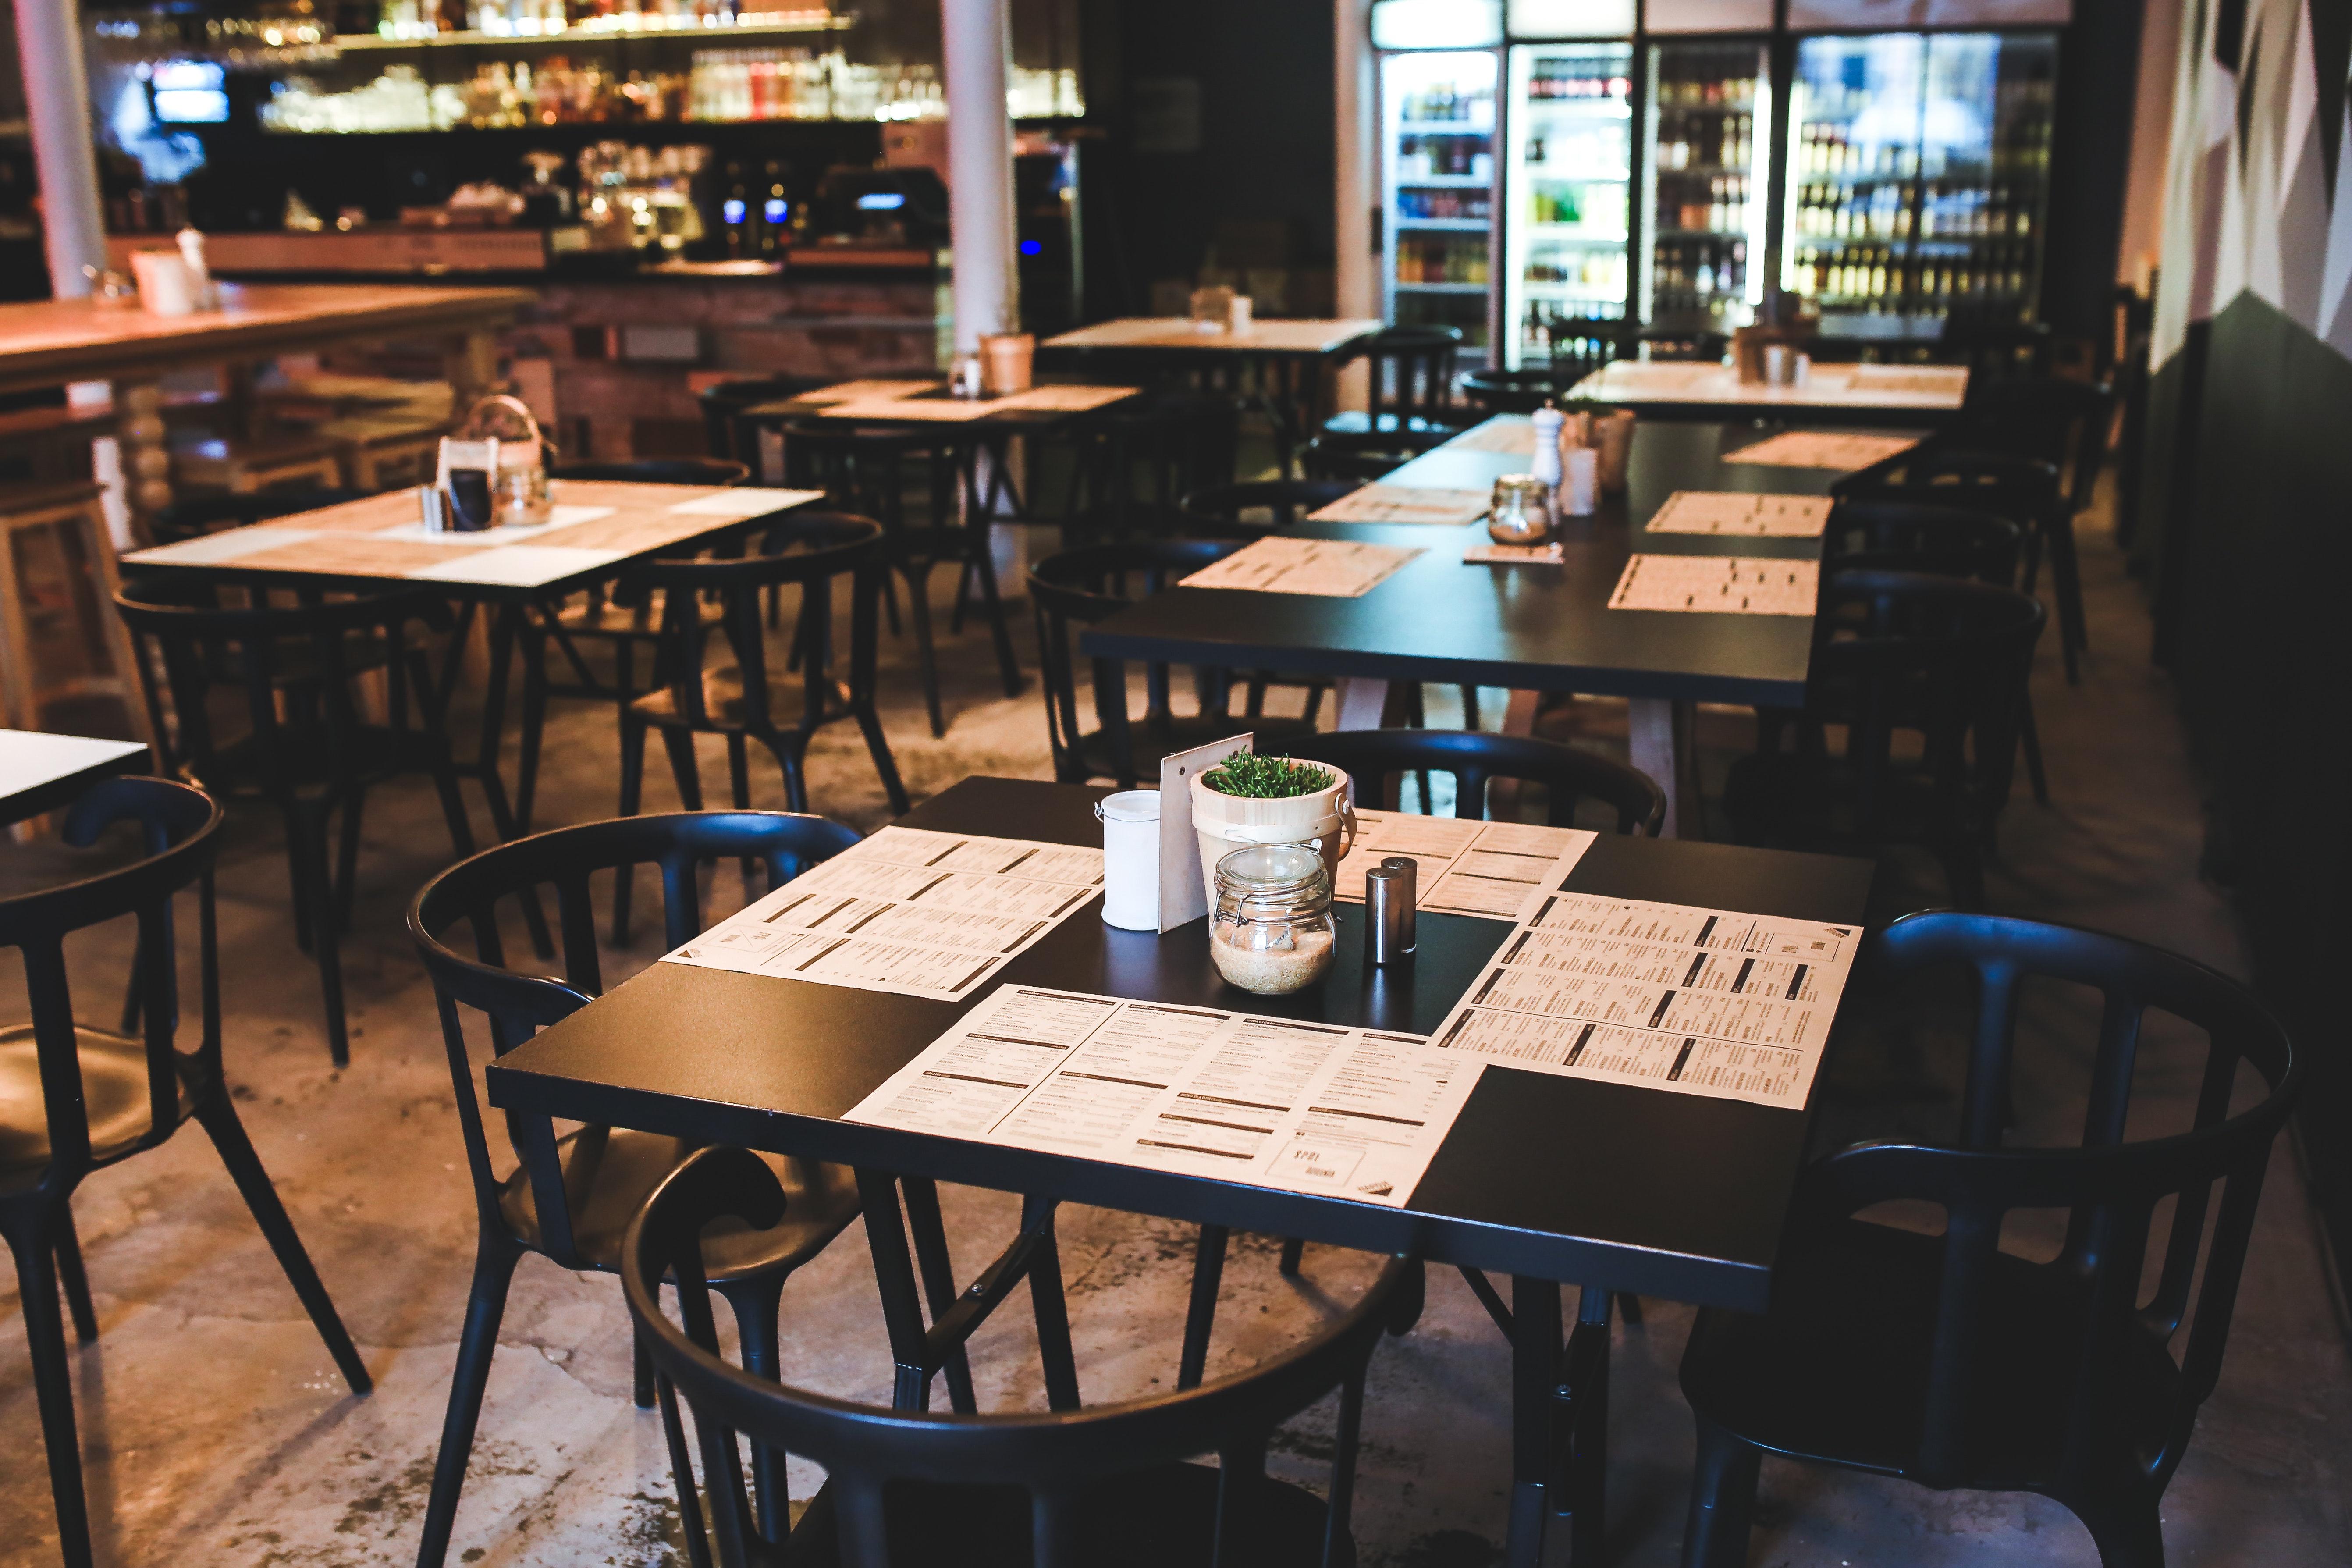 chairs-menu-restaurant-6267 copy